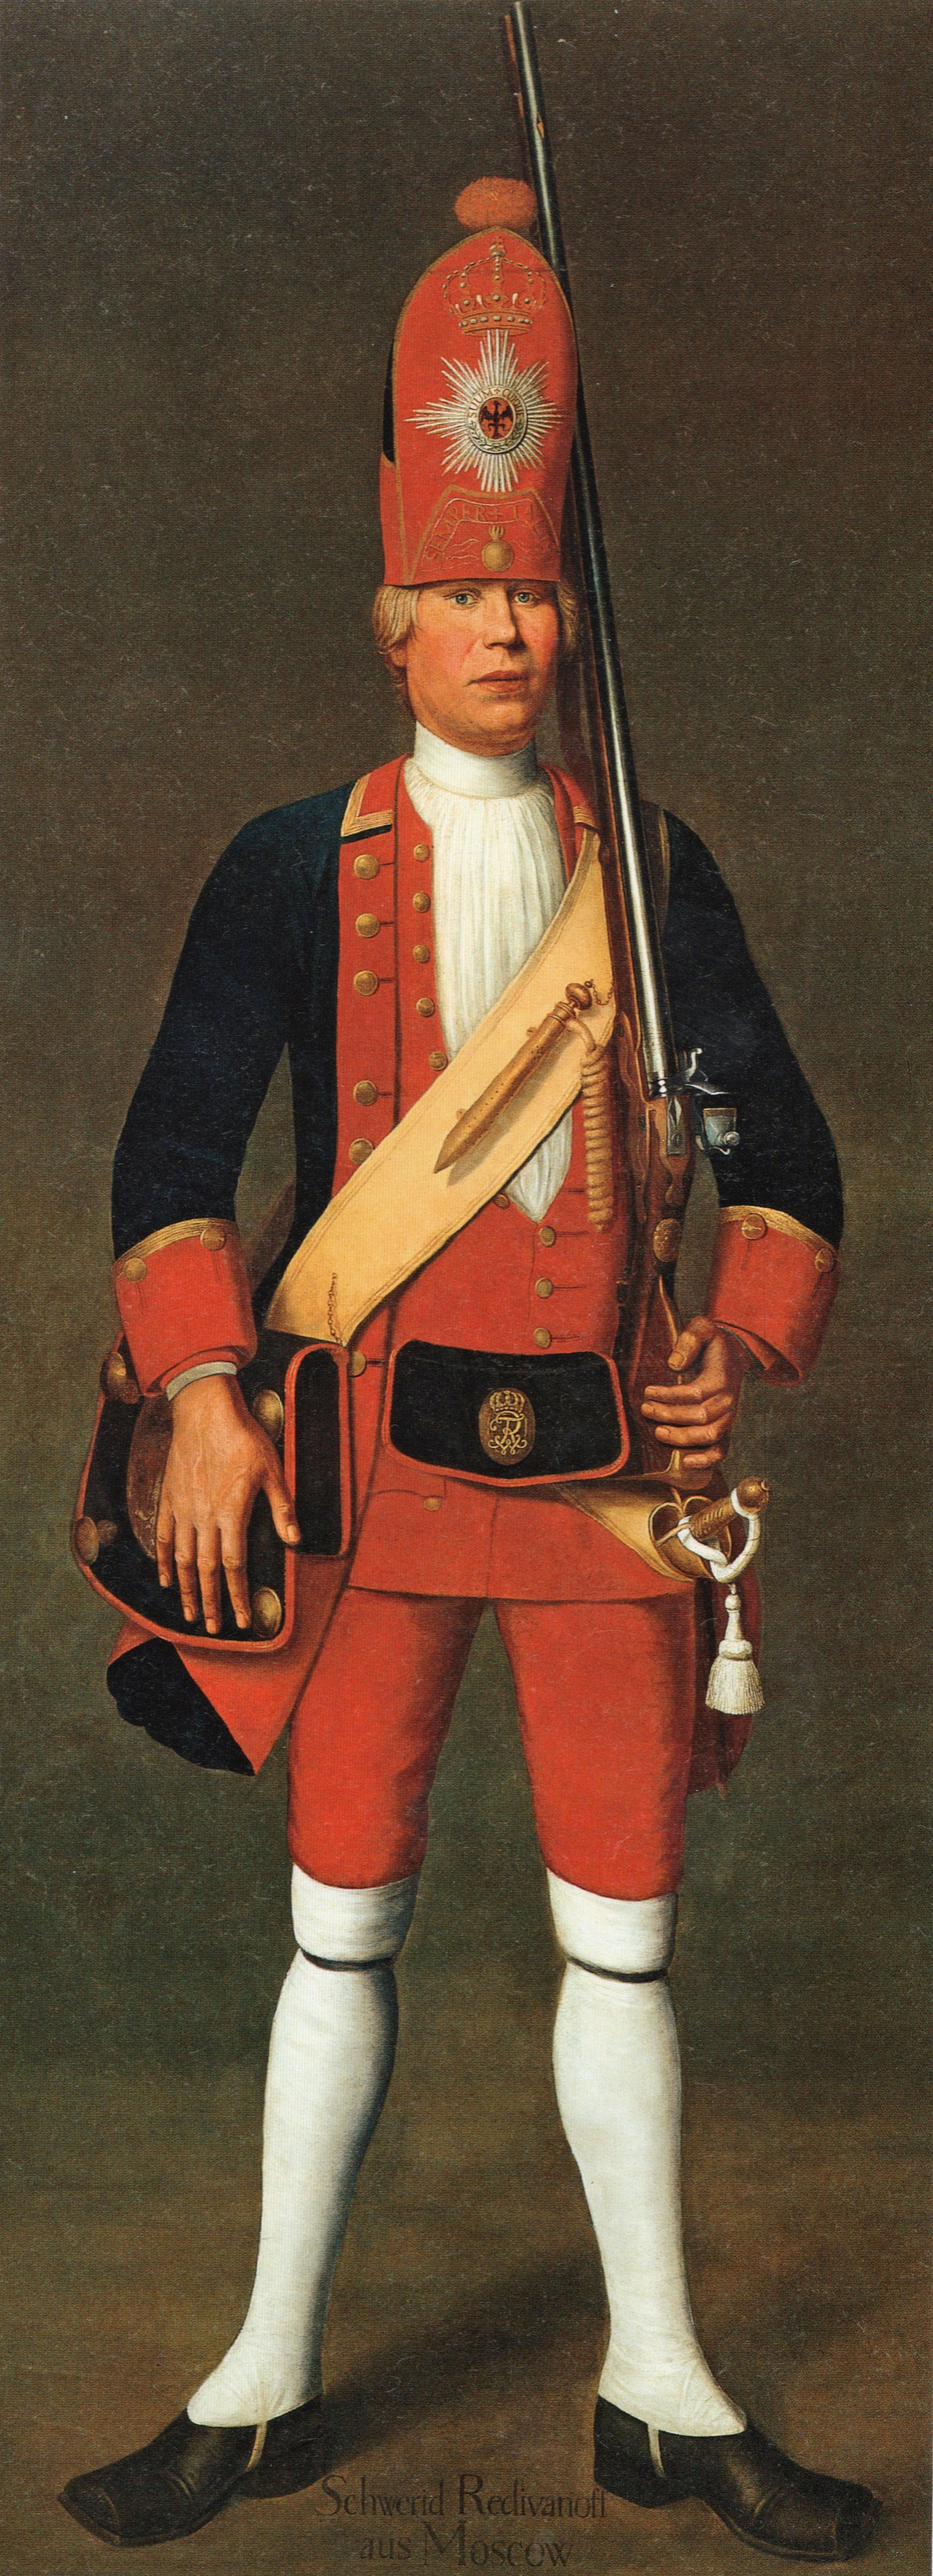 Langer Kerl - Grenadier der Potsdamer Leibgarde des Soldatenkönigs - Ölbild von Johann C. Merk 1718/1719